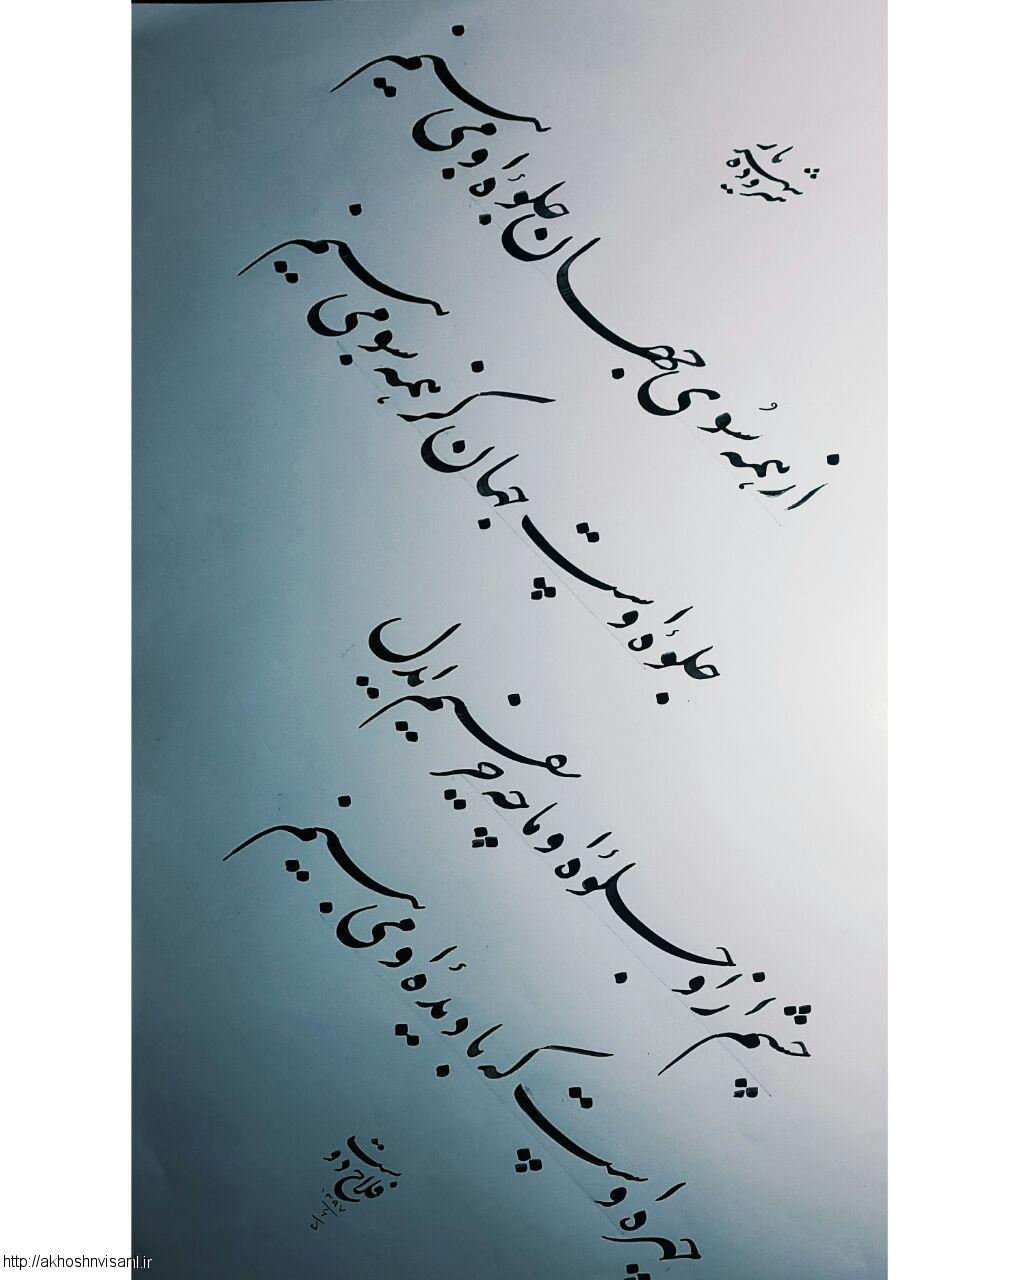 ry4_فلاح_دوست_شهریار.jpg